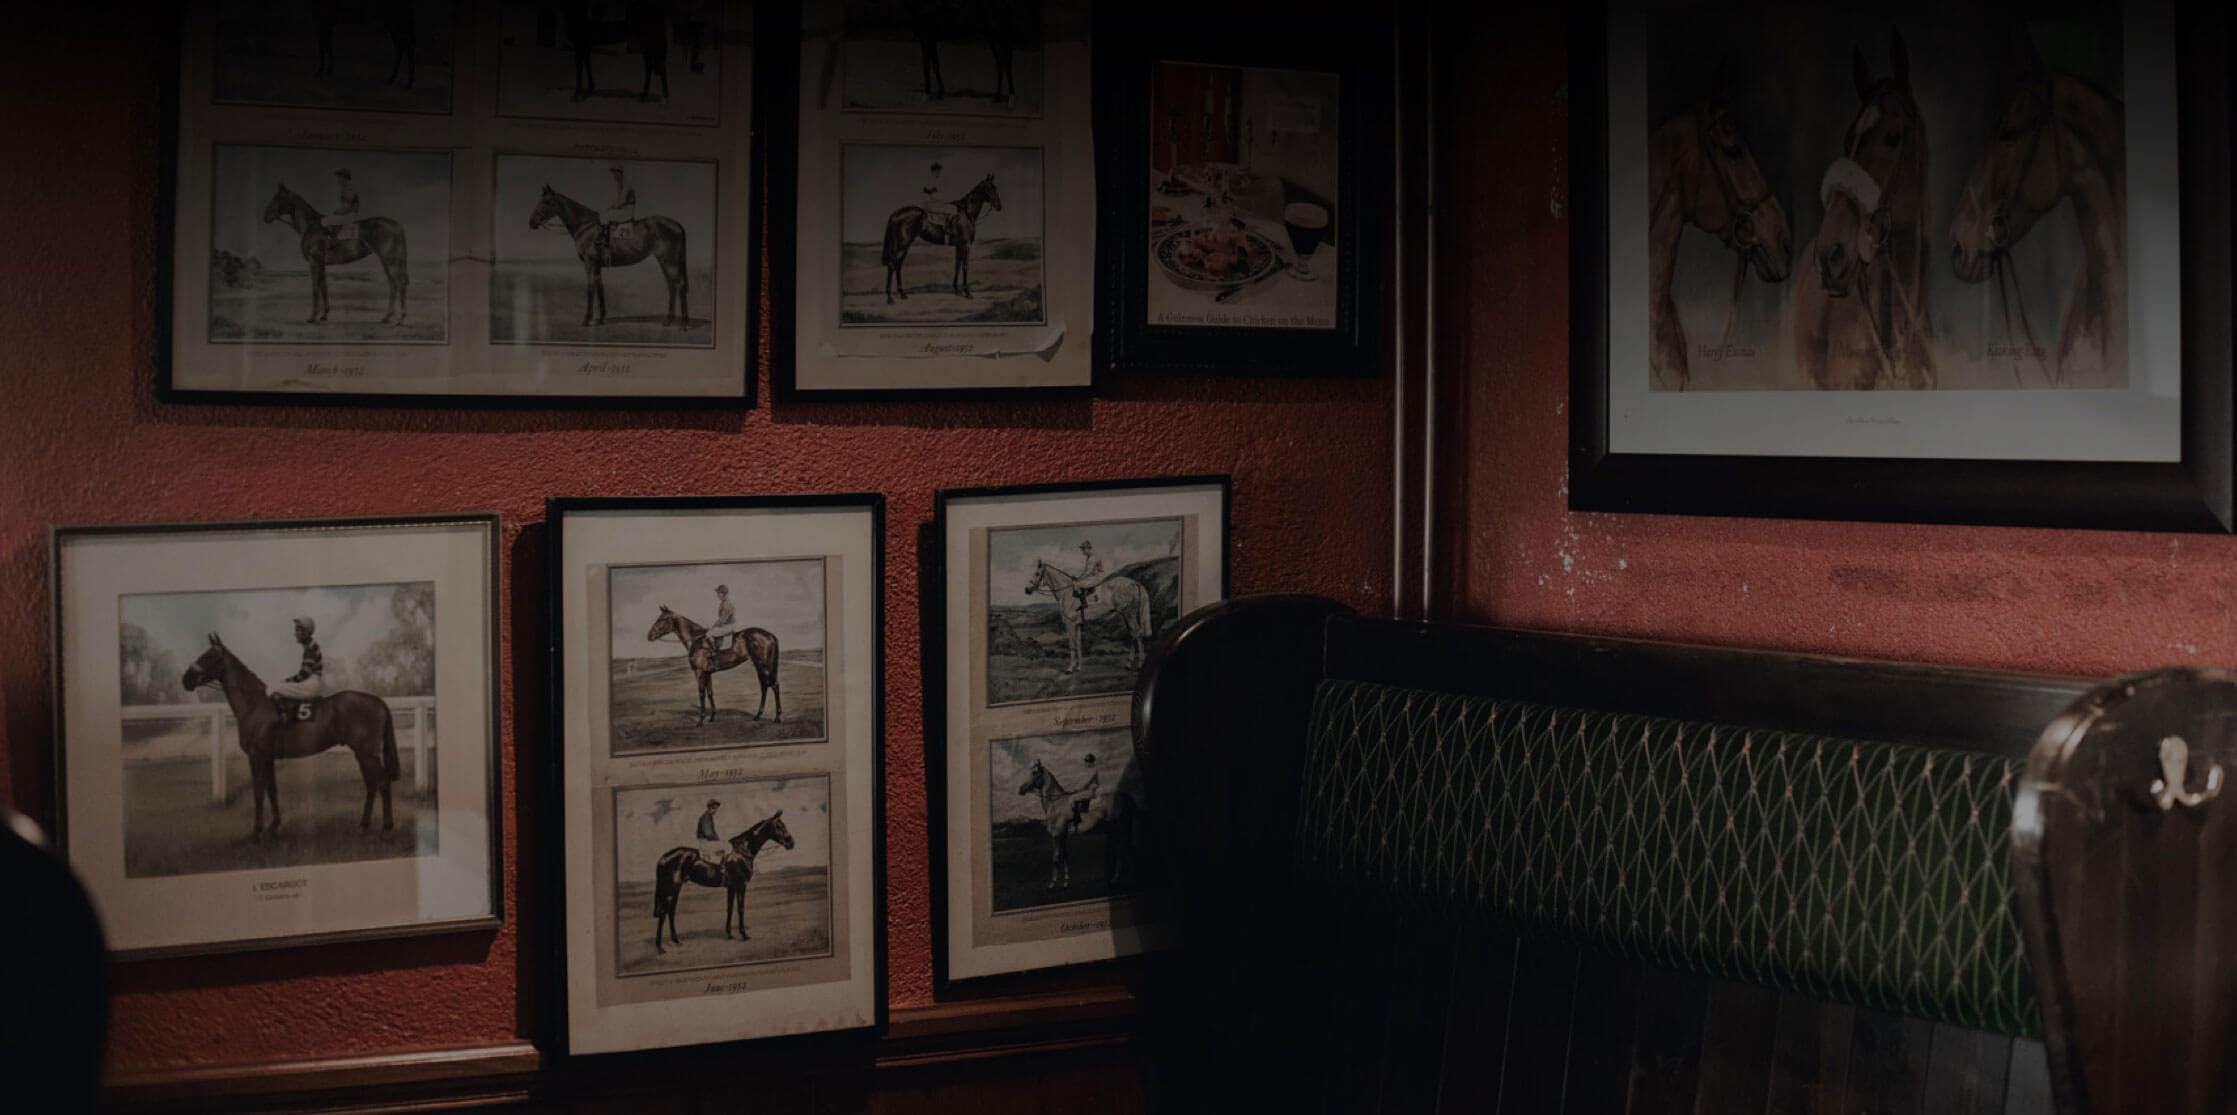 The Snailbox - Bar, Food, Accommodation & Meeting Facilities